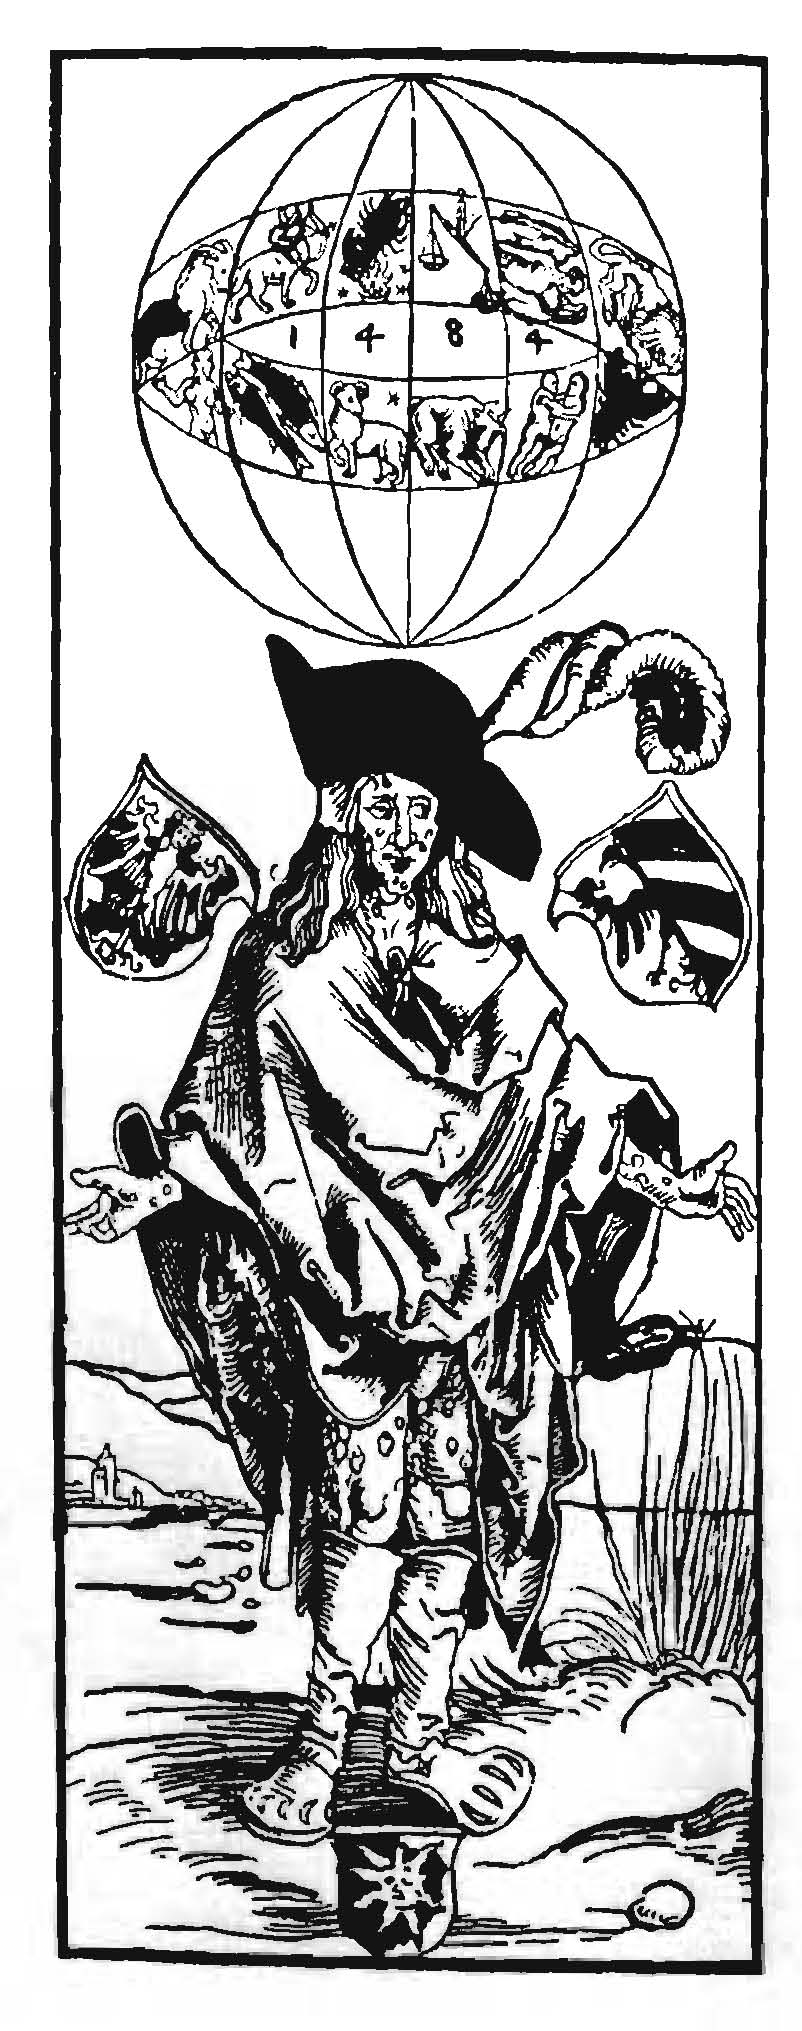 Albrecht Durer's woodcut of a syphilitic man.